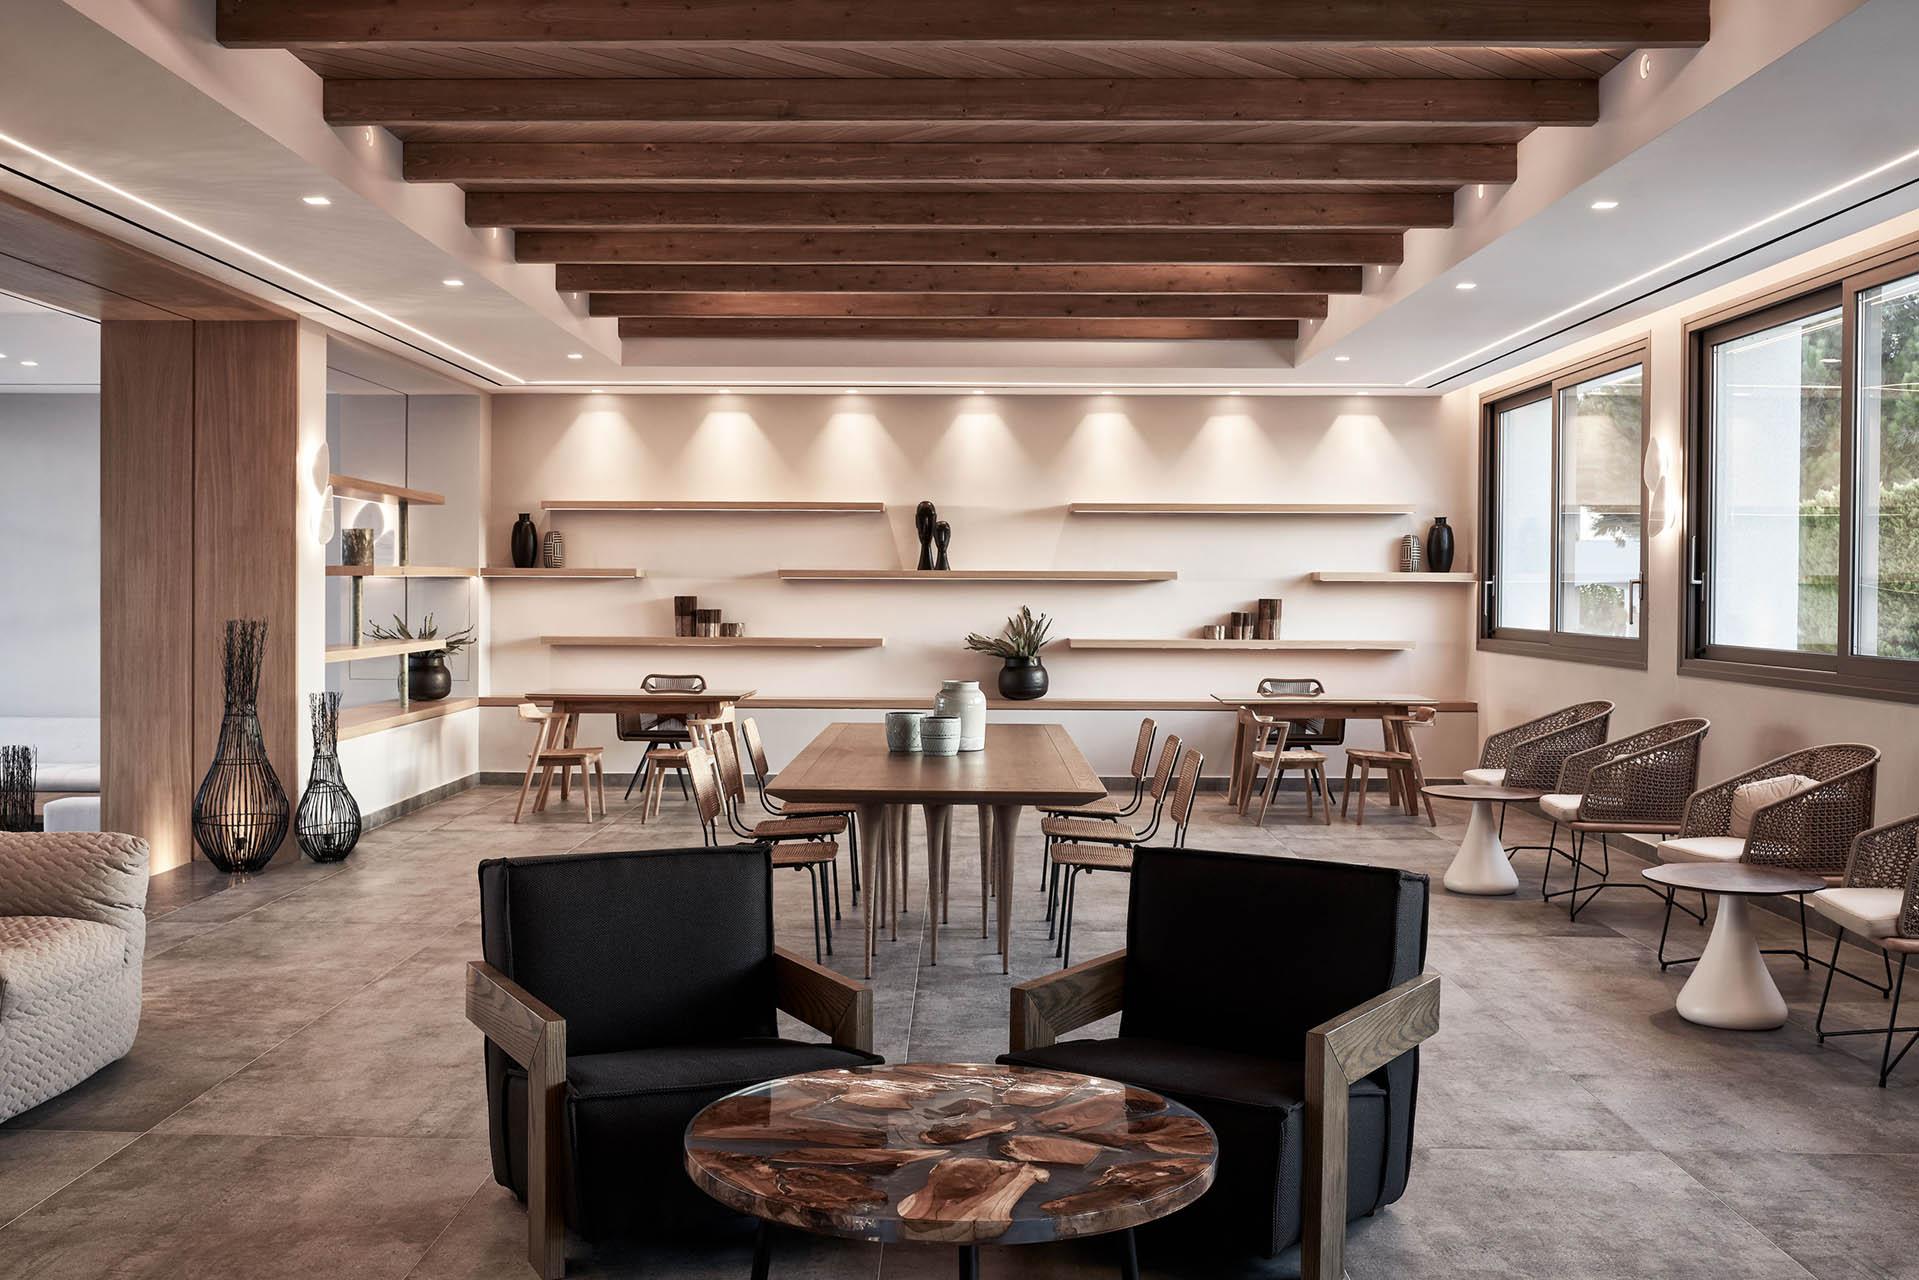 drz_atlantica-hotels-kos_27025